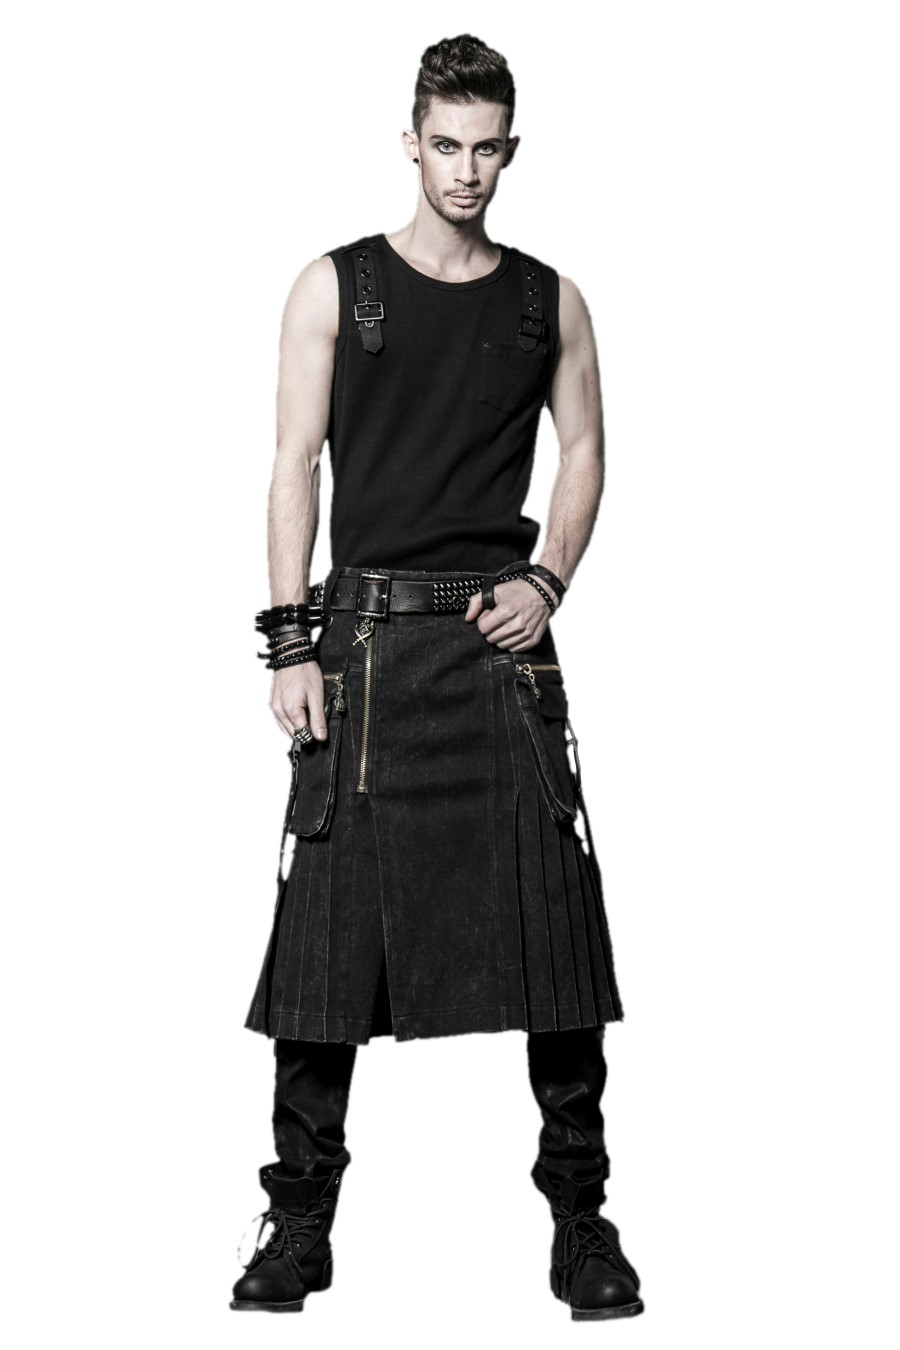 kilt gothique noir punk rave q225 en tissu jean. Black Bedroom Furniture Sets. Home Design Ideas